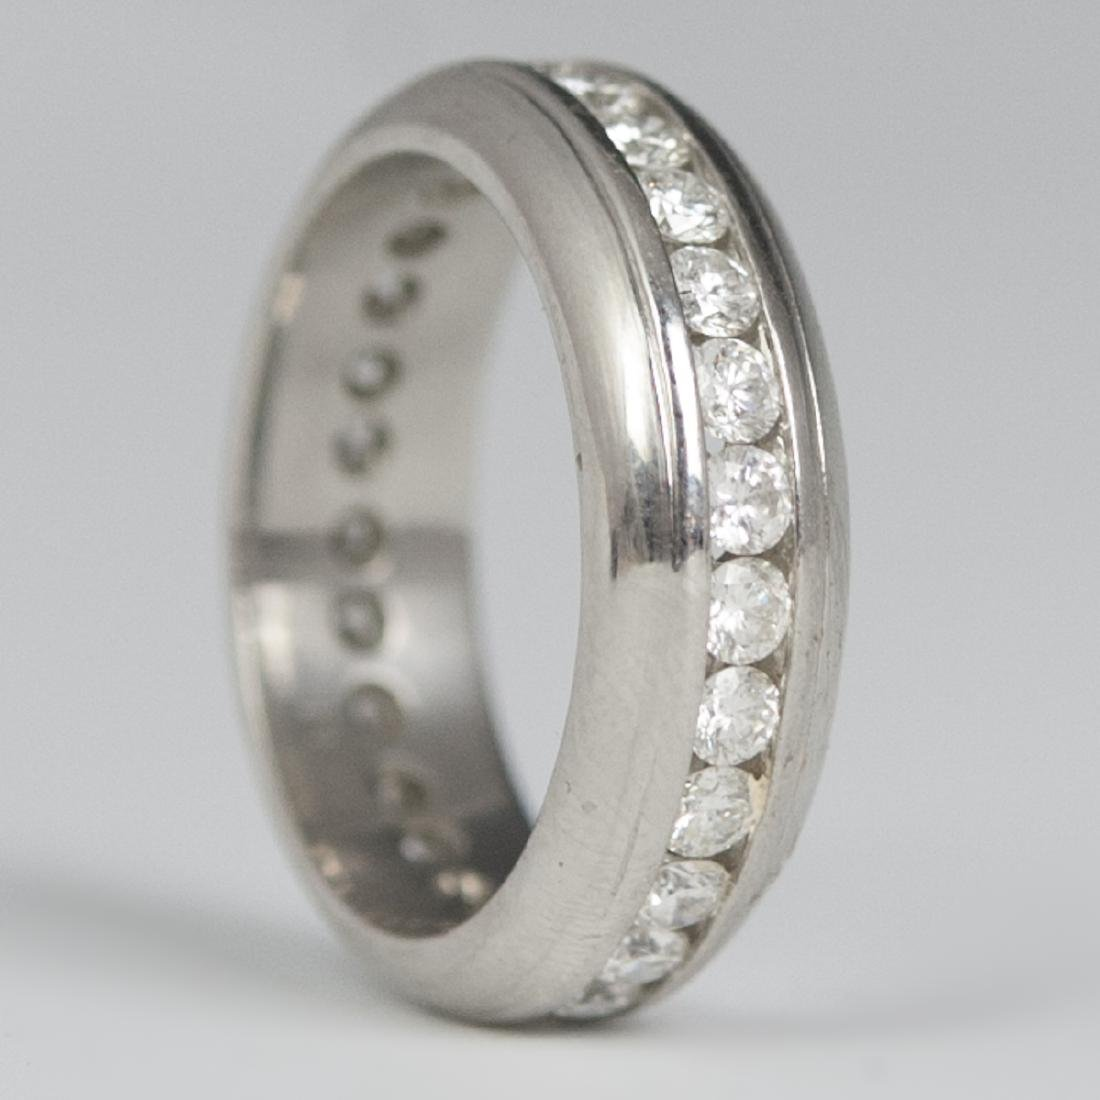 Mayor's Platinum & Diamond Eternity Ring